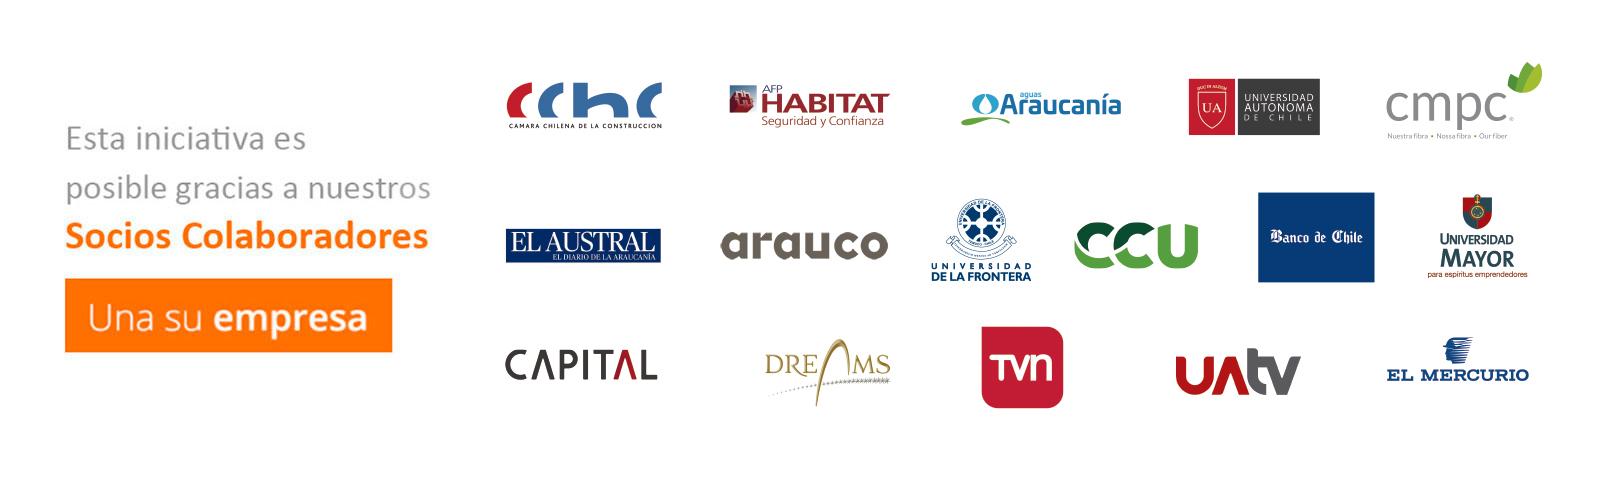 slider-logos 2019